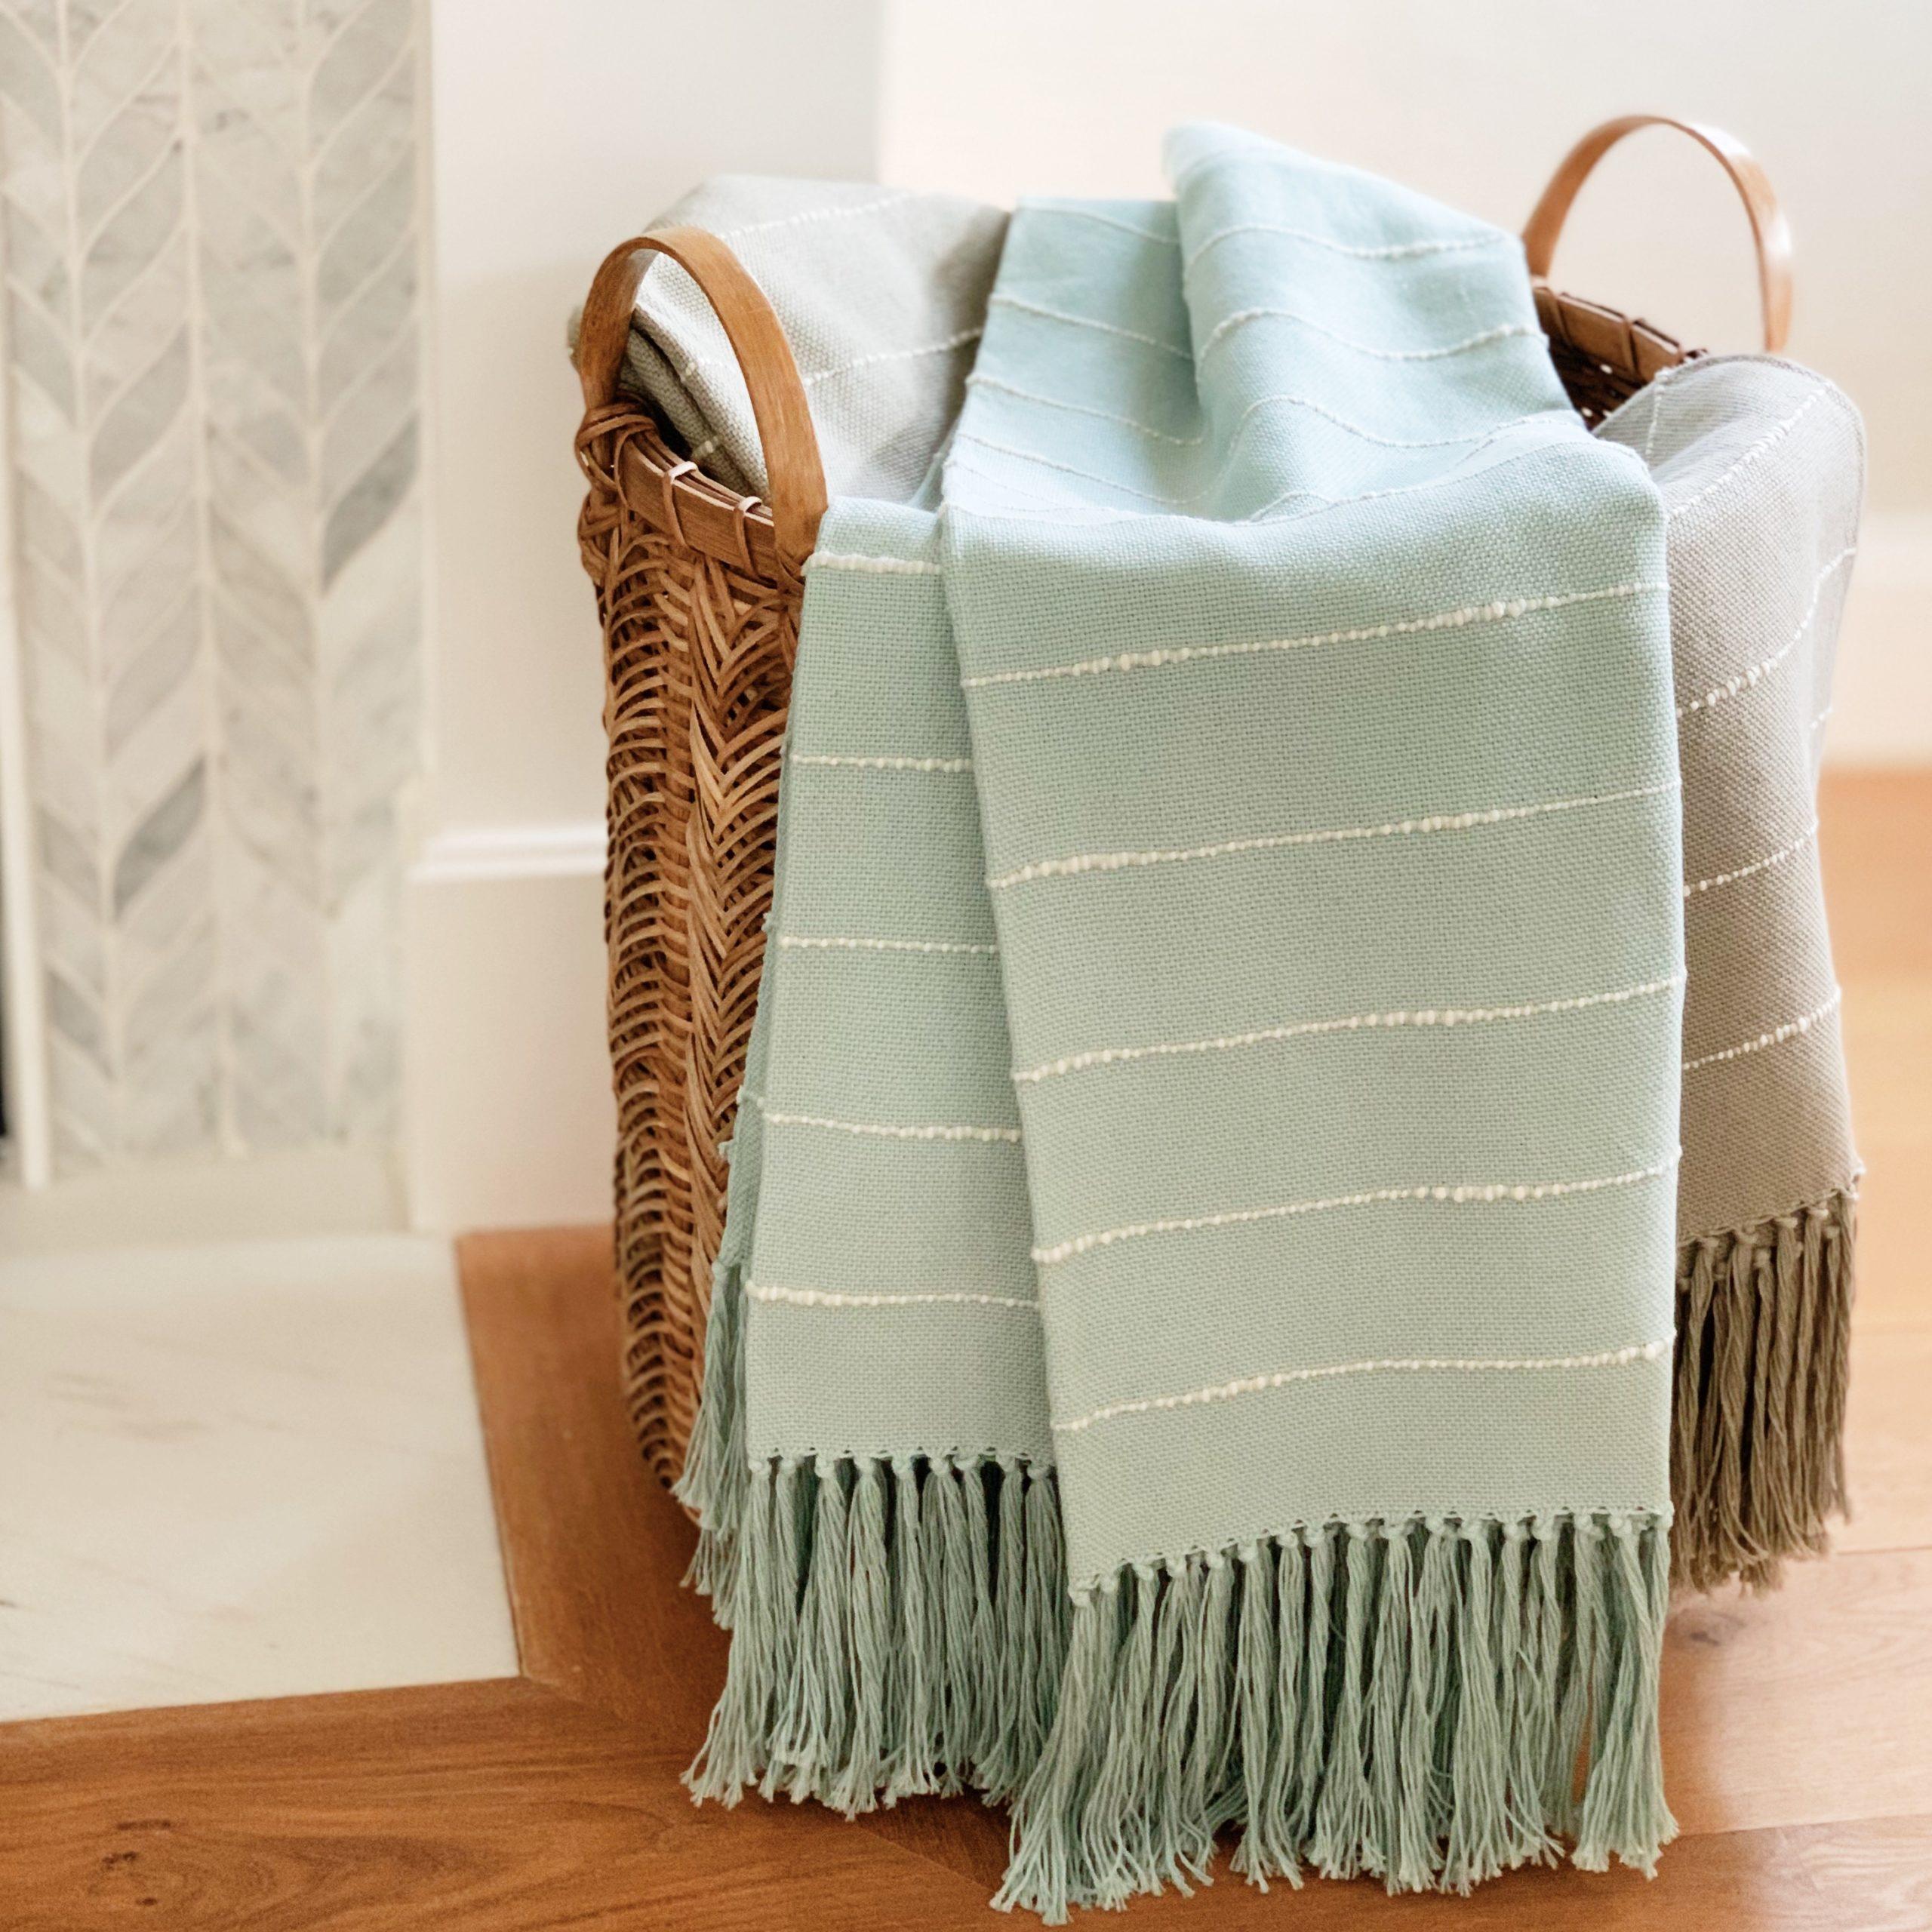 Pampa Cotton - Seafoam